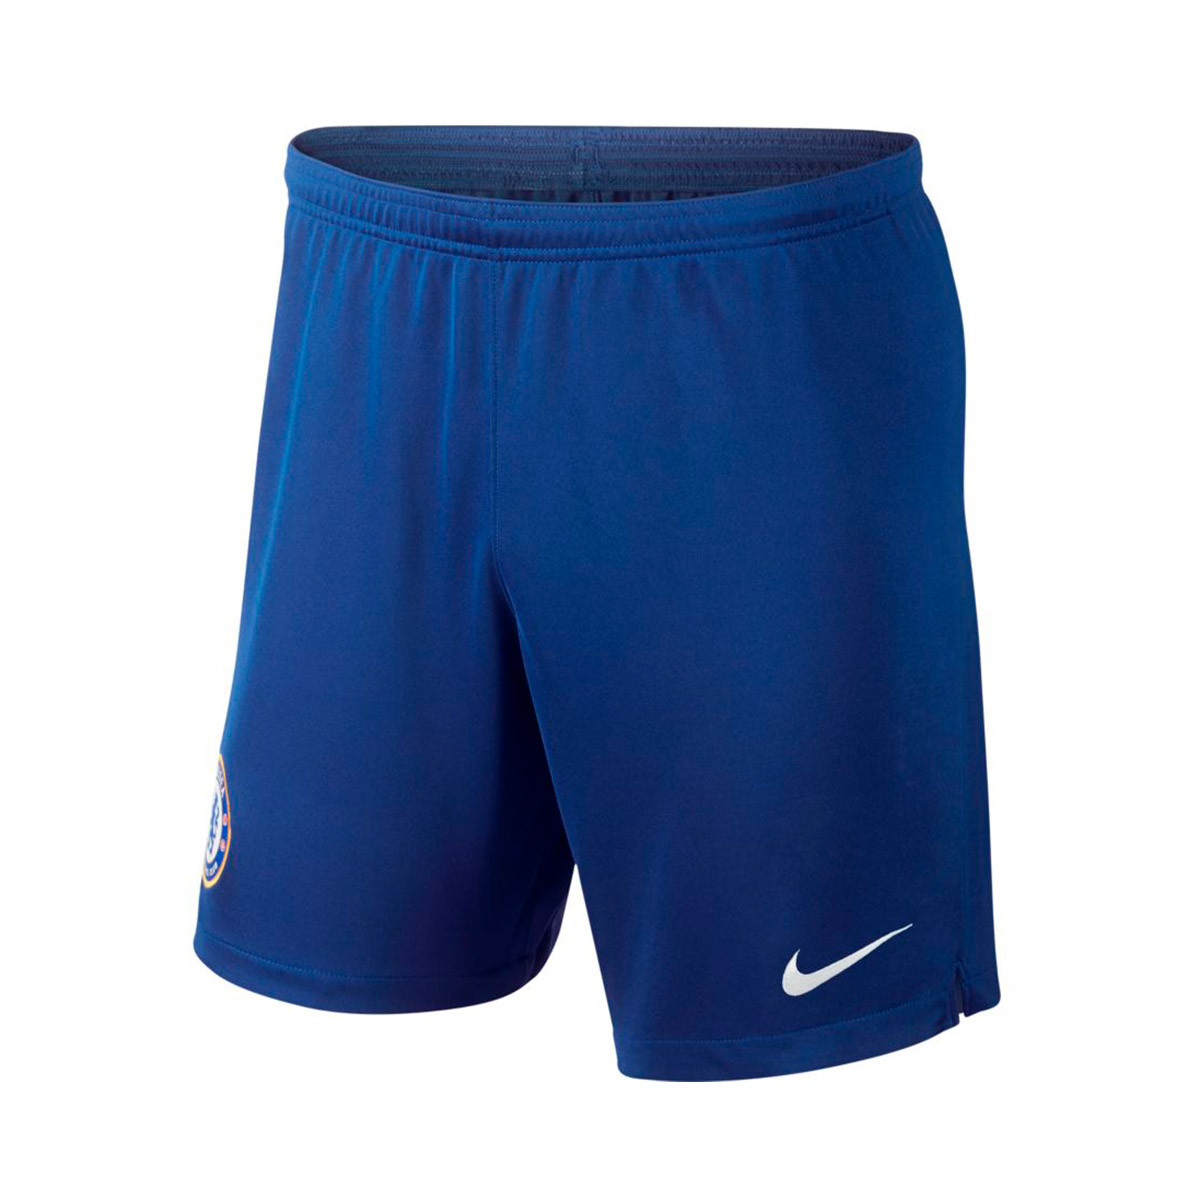 452625a59 Shorts Nike Chelsea FC Breathe Stadium 2019-2020 Home Away Rush blue-White  - Football store Fútbol Emotion